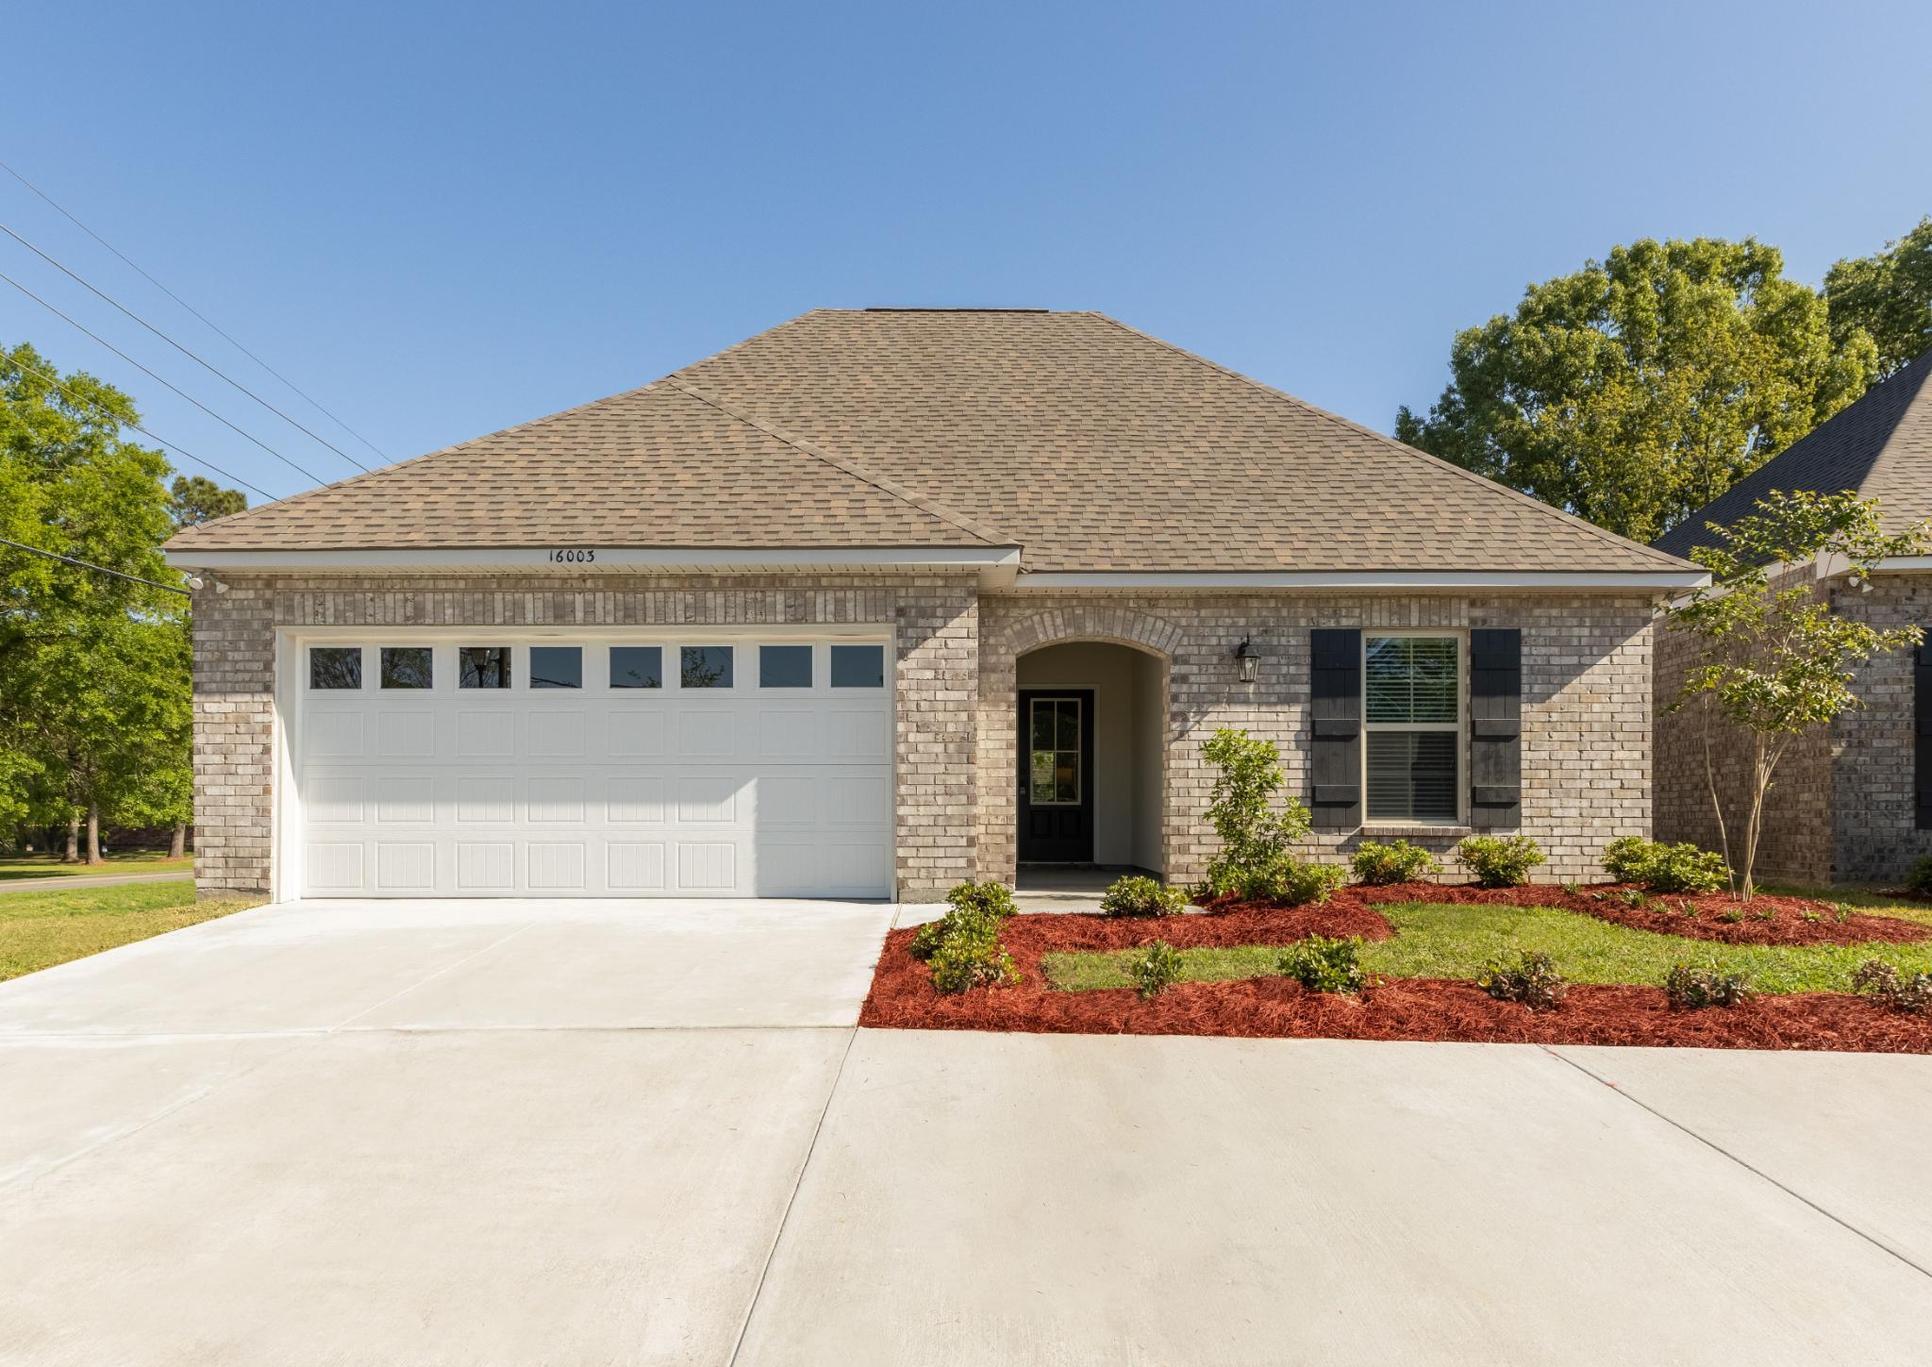 new home community in baton rouge, la - summer gardens:Summer Gardens Model Home - DSLD Homes-Baton Rouge, LA-Navona III B